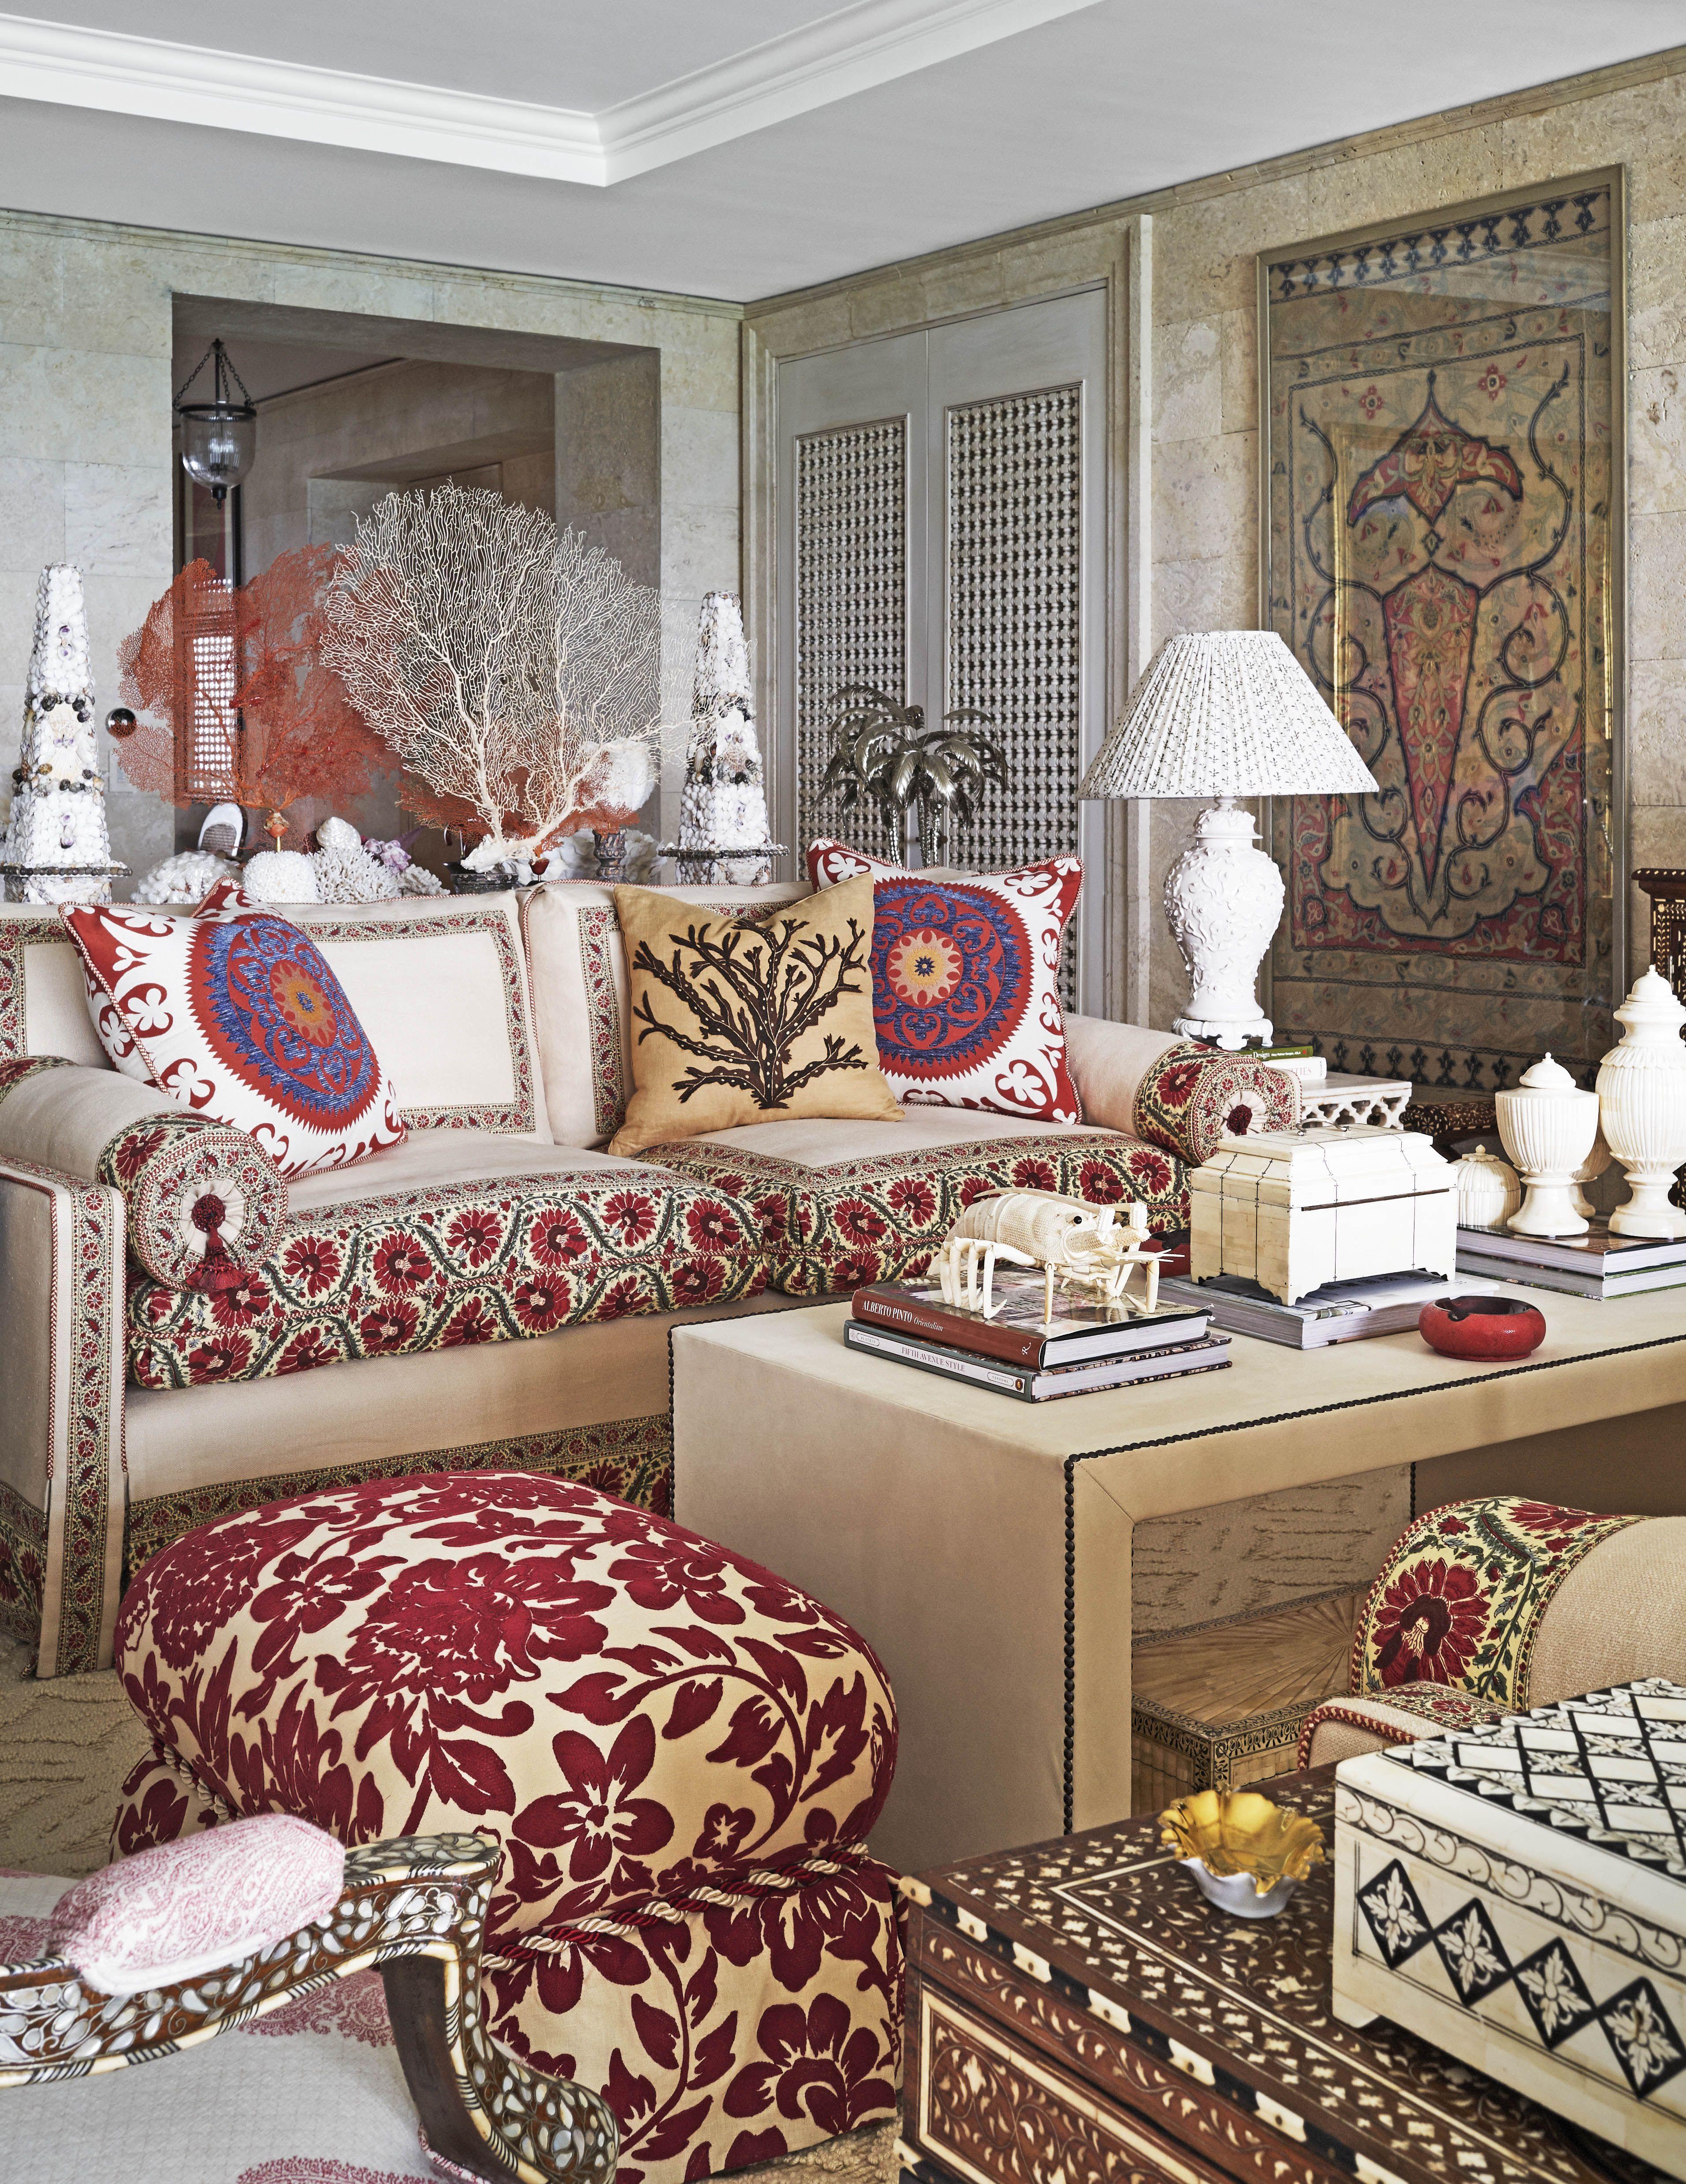 sid-bergamin-miami-sitting-room-veranda